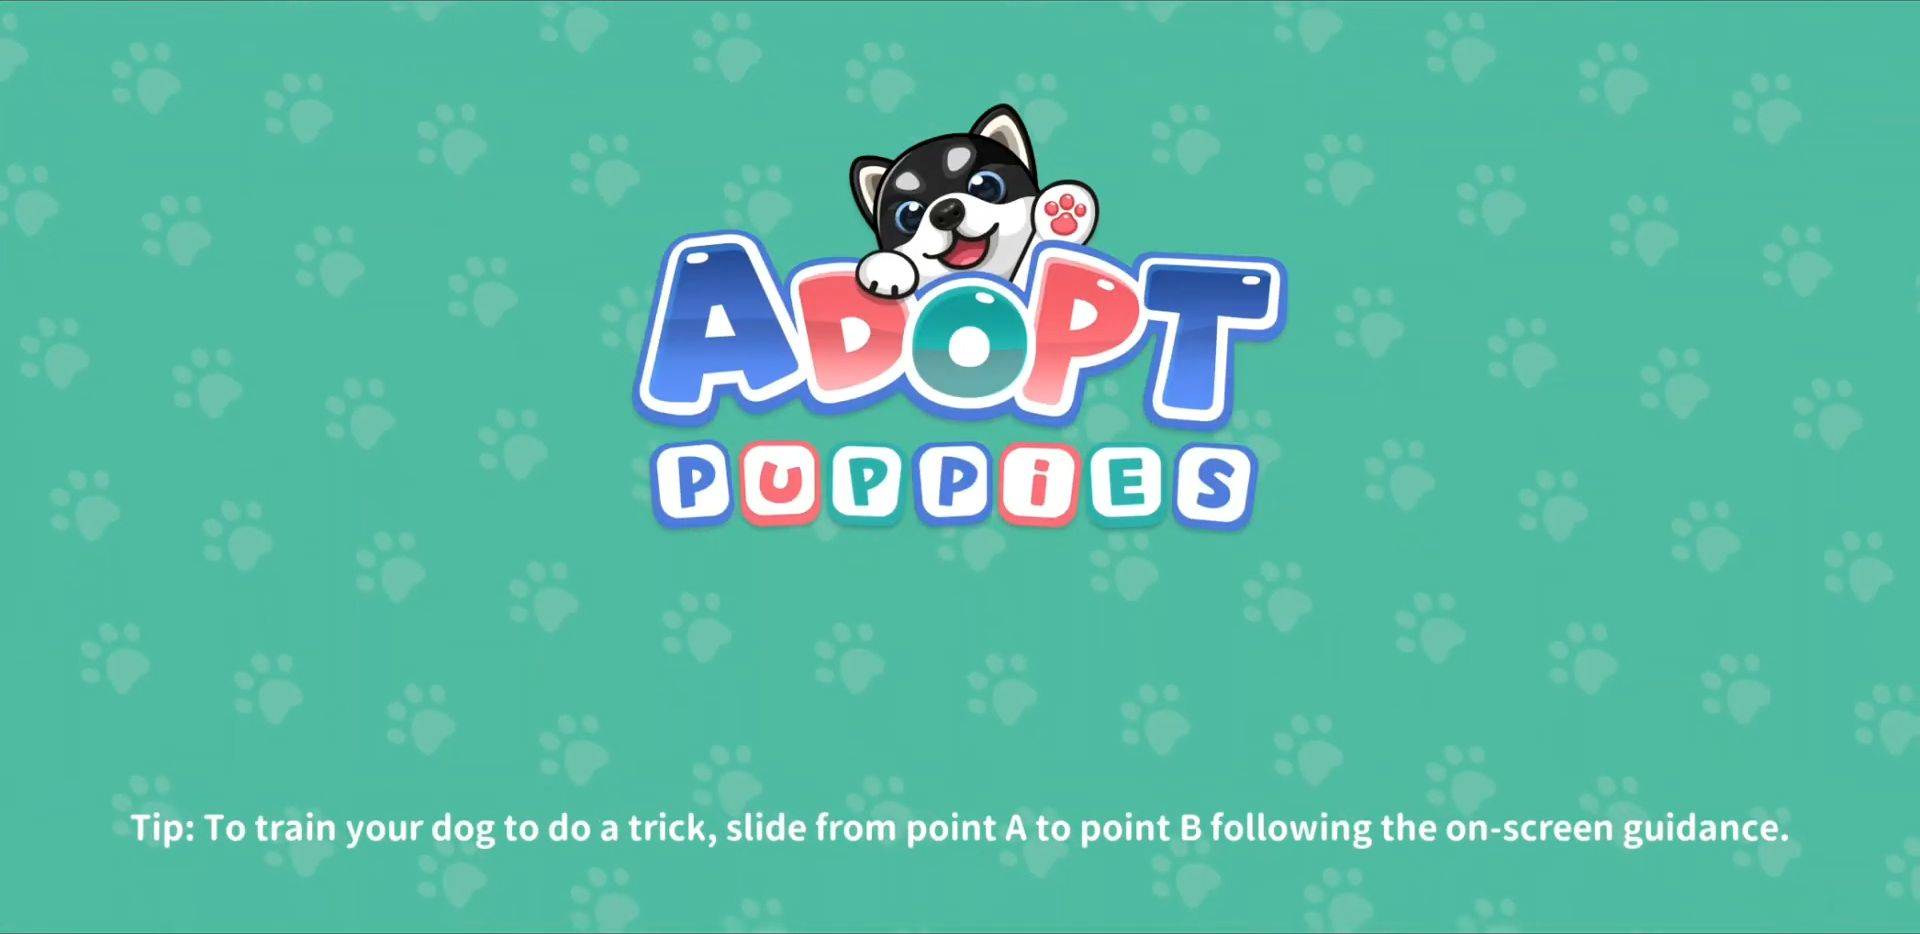 Adopt Puppies скріншот 1